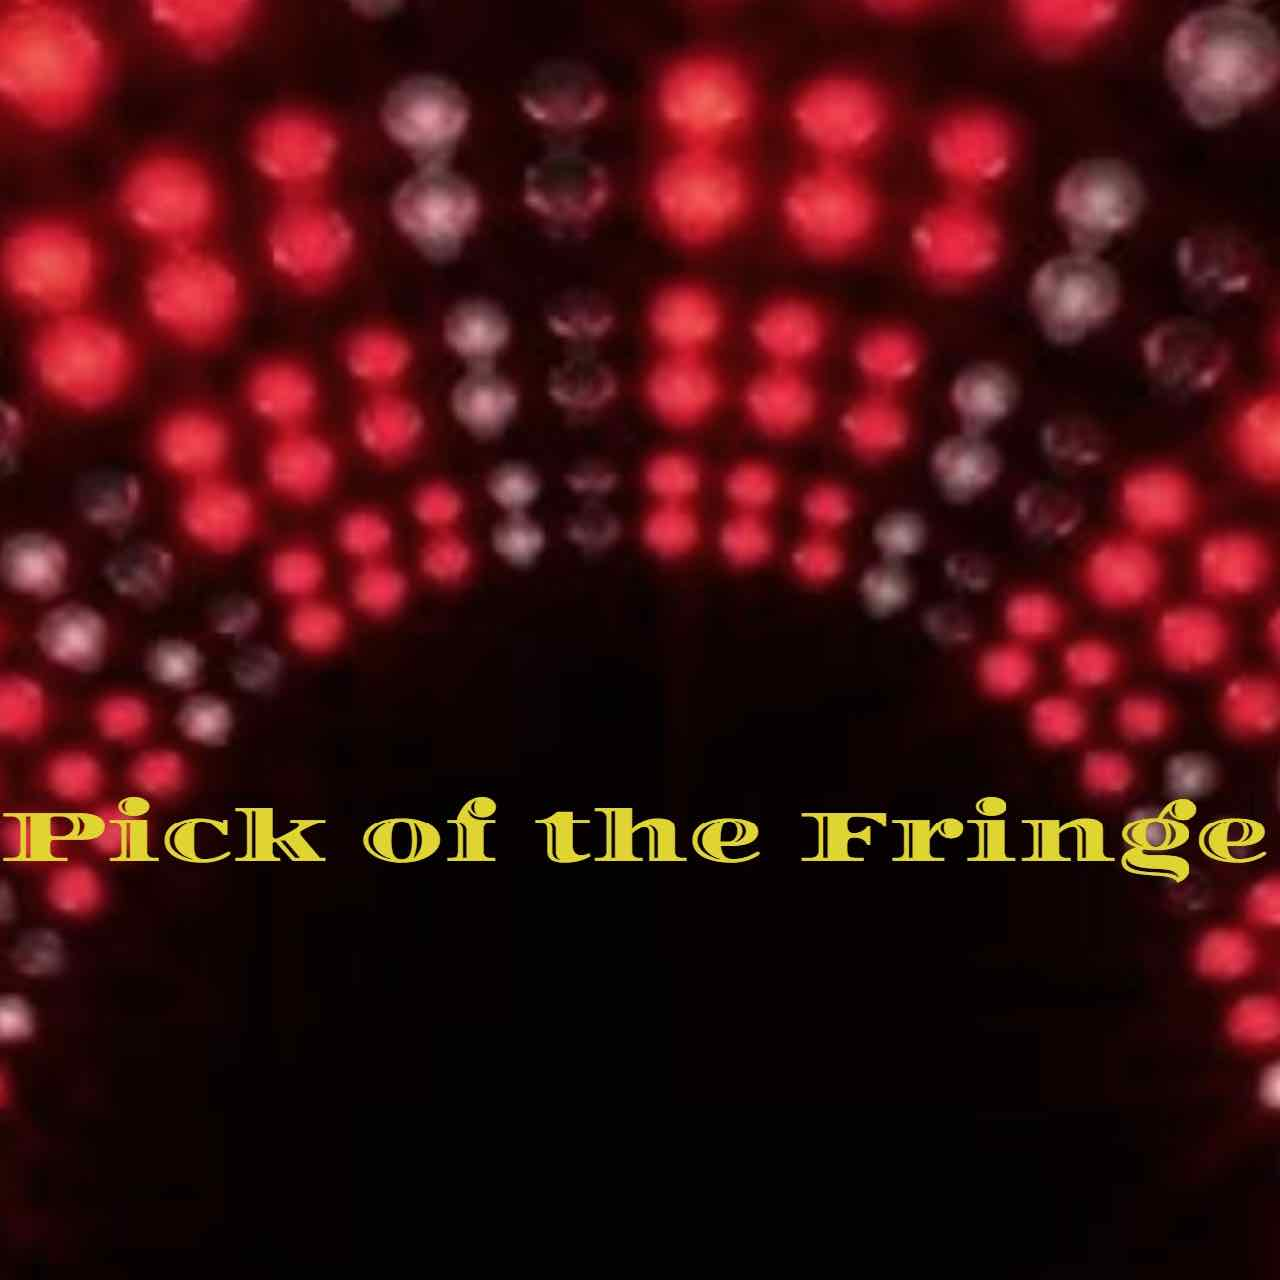 Pick of the Fringe    5:30pm - The Royal